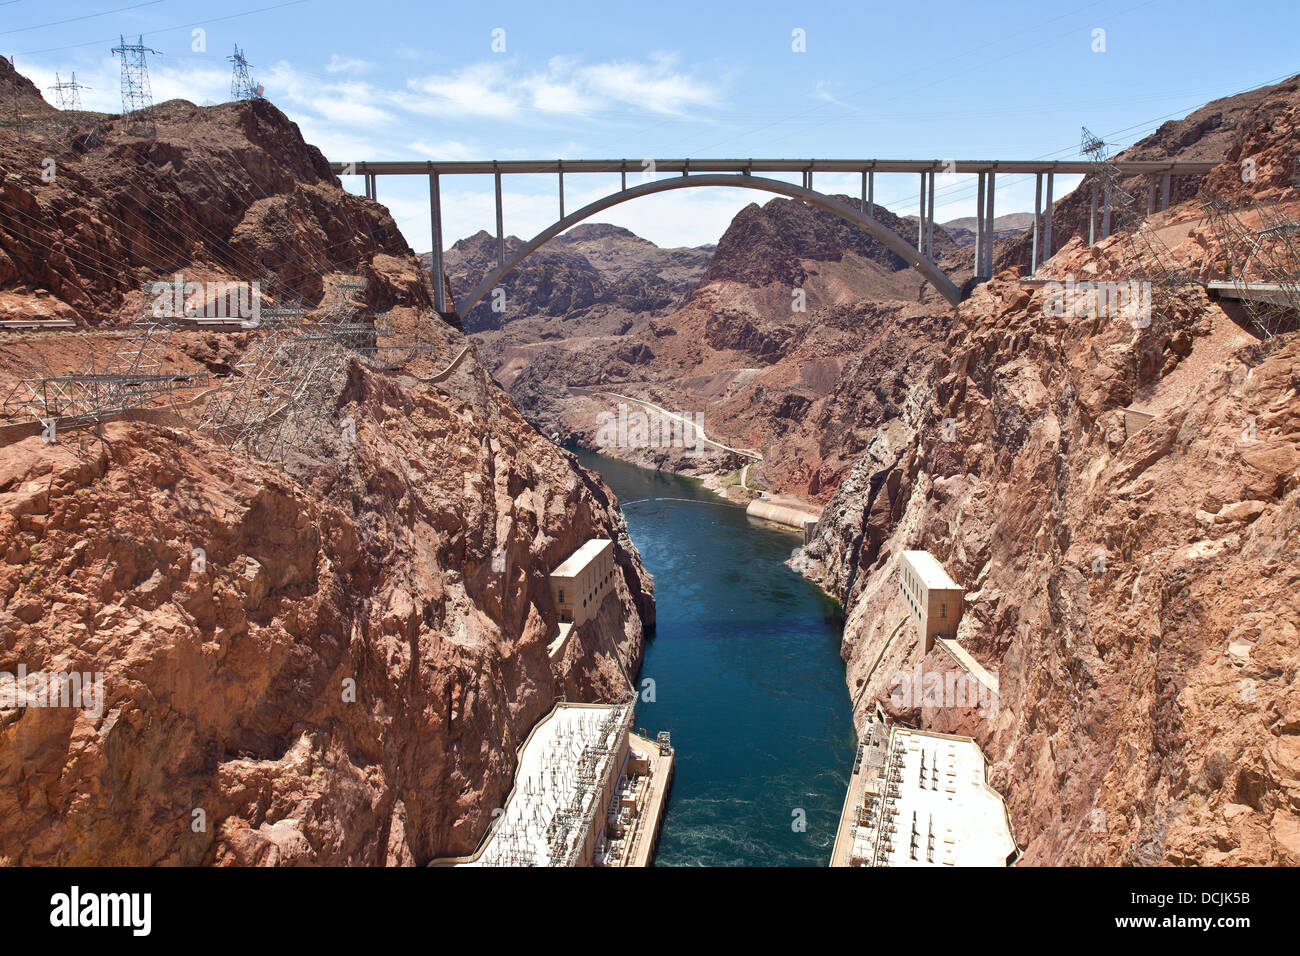 Hoover Dam Canyonland and bridge connecting two states Nevada - Arizona. - Stock Image